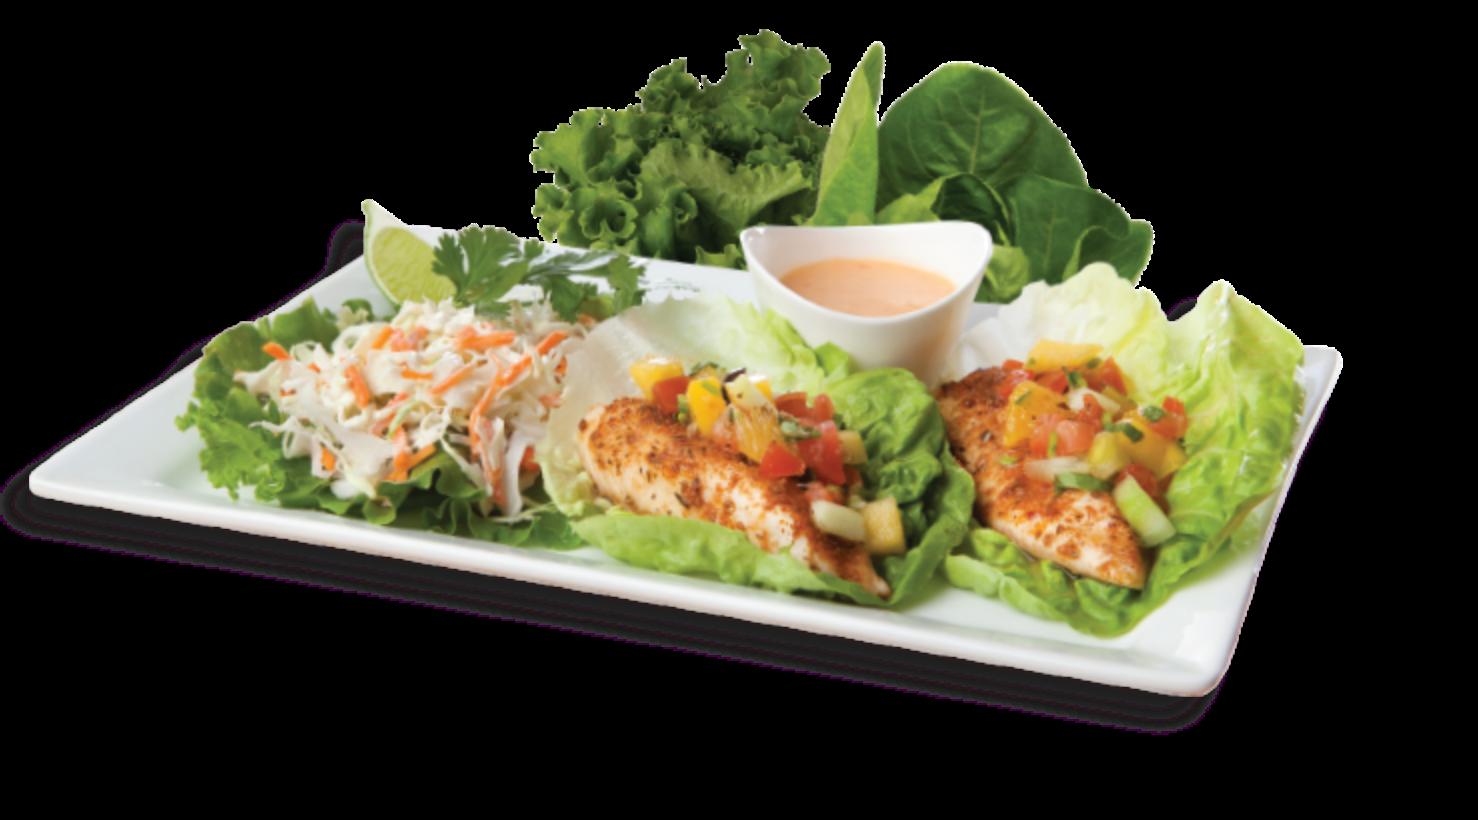 Fish & Salad Plate